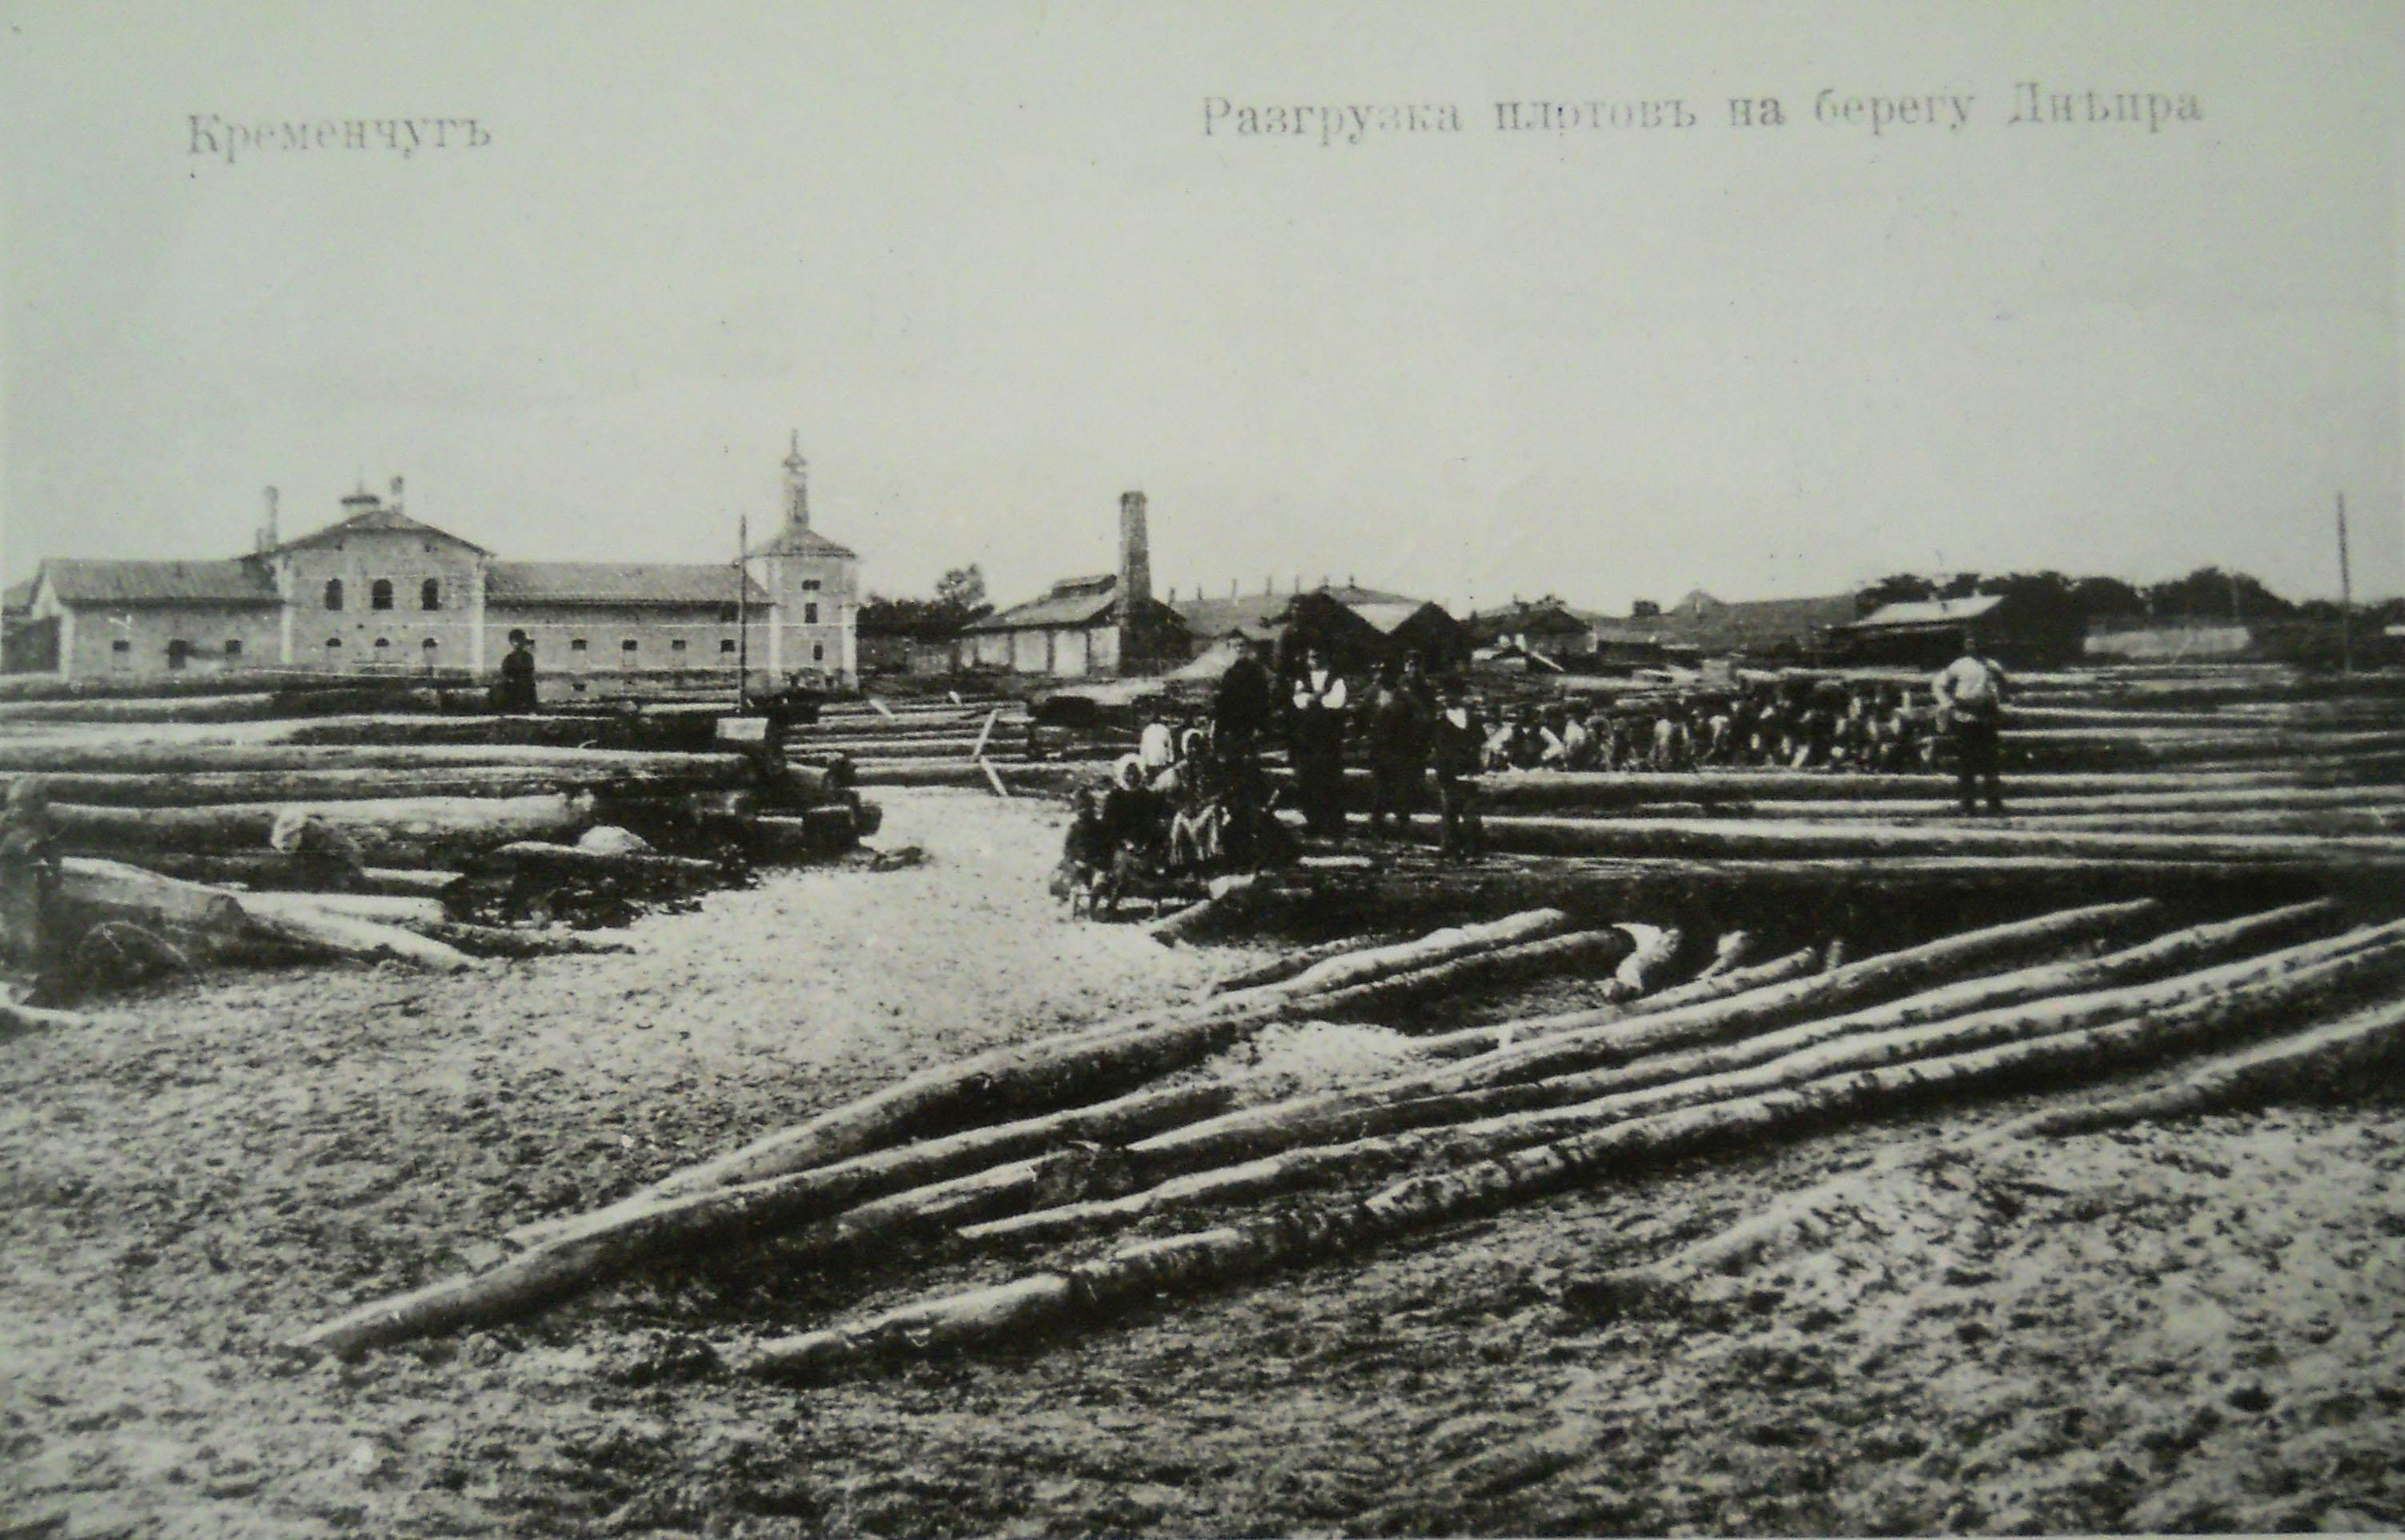 Разгрузка плотов на берегу Днепра